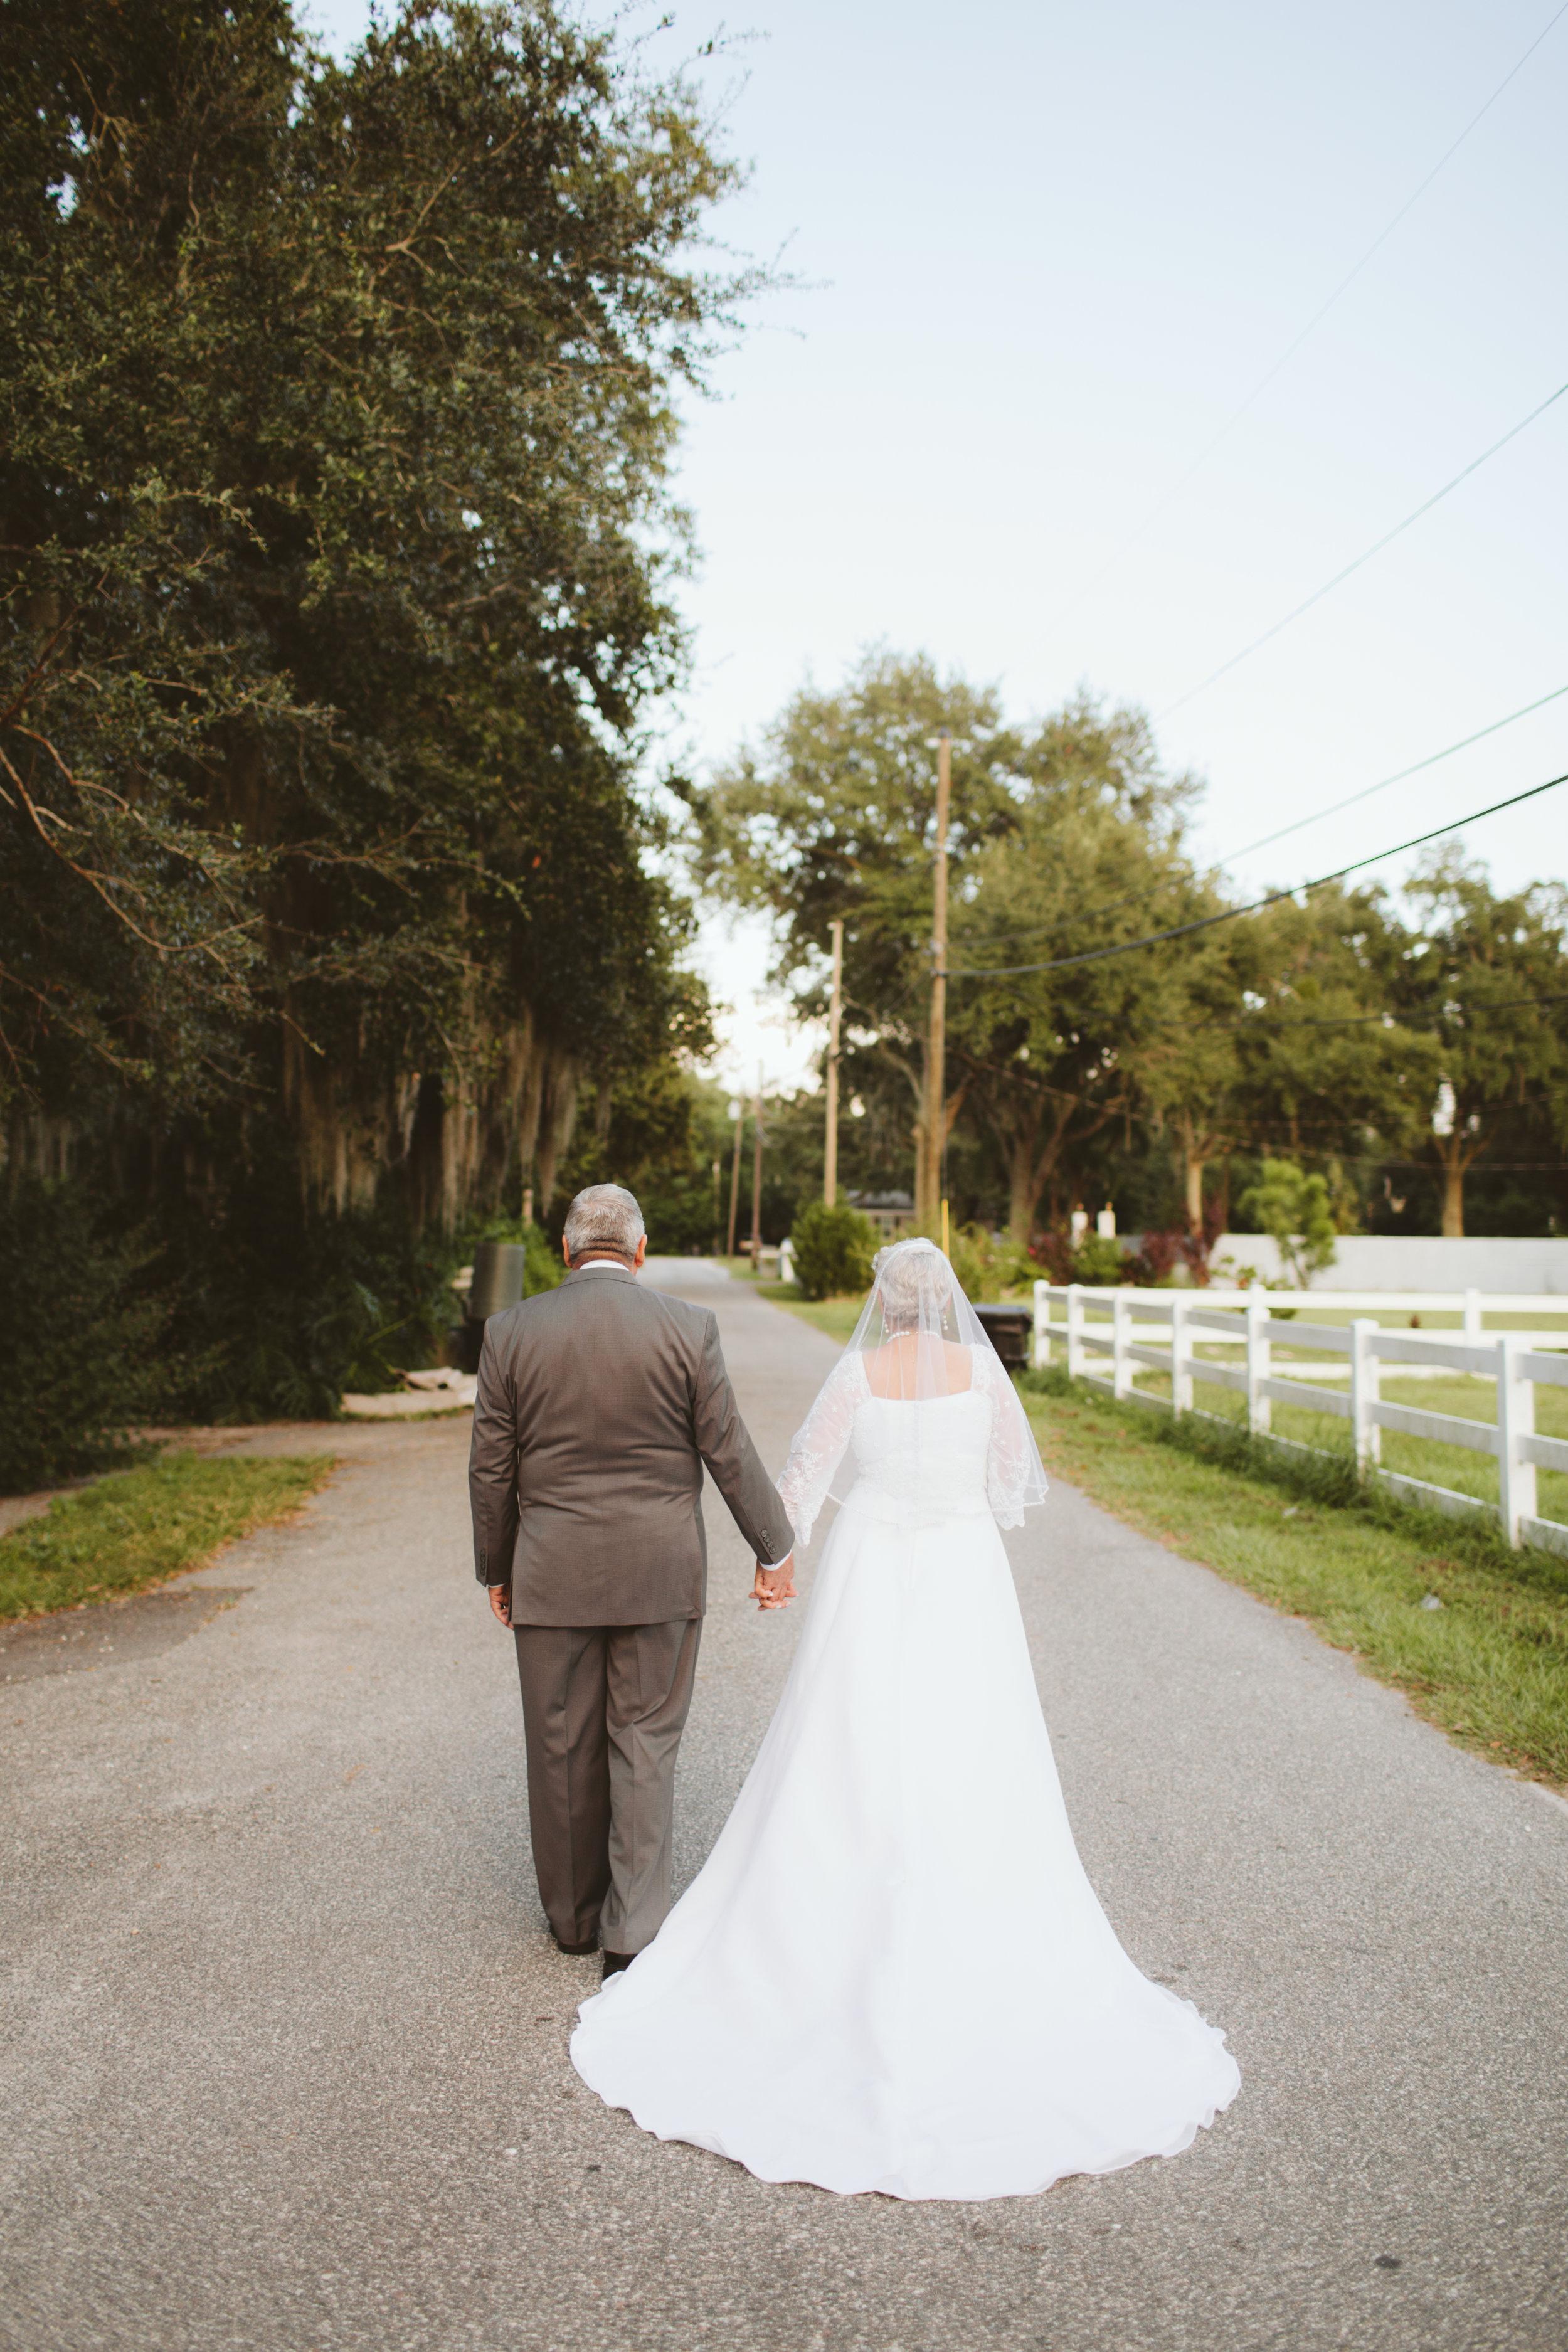 wedding | Vanessa Boy Photography | vanessaboy.com |-219.jpg